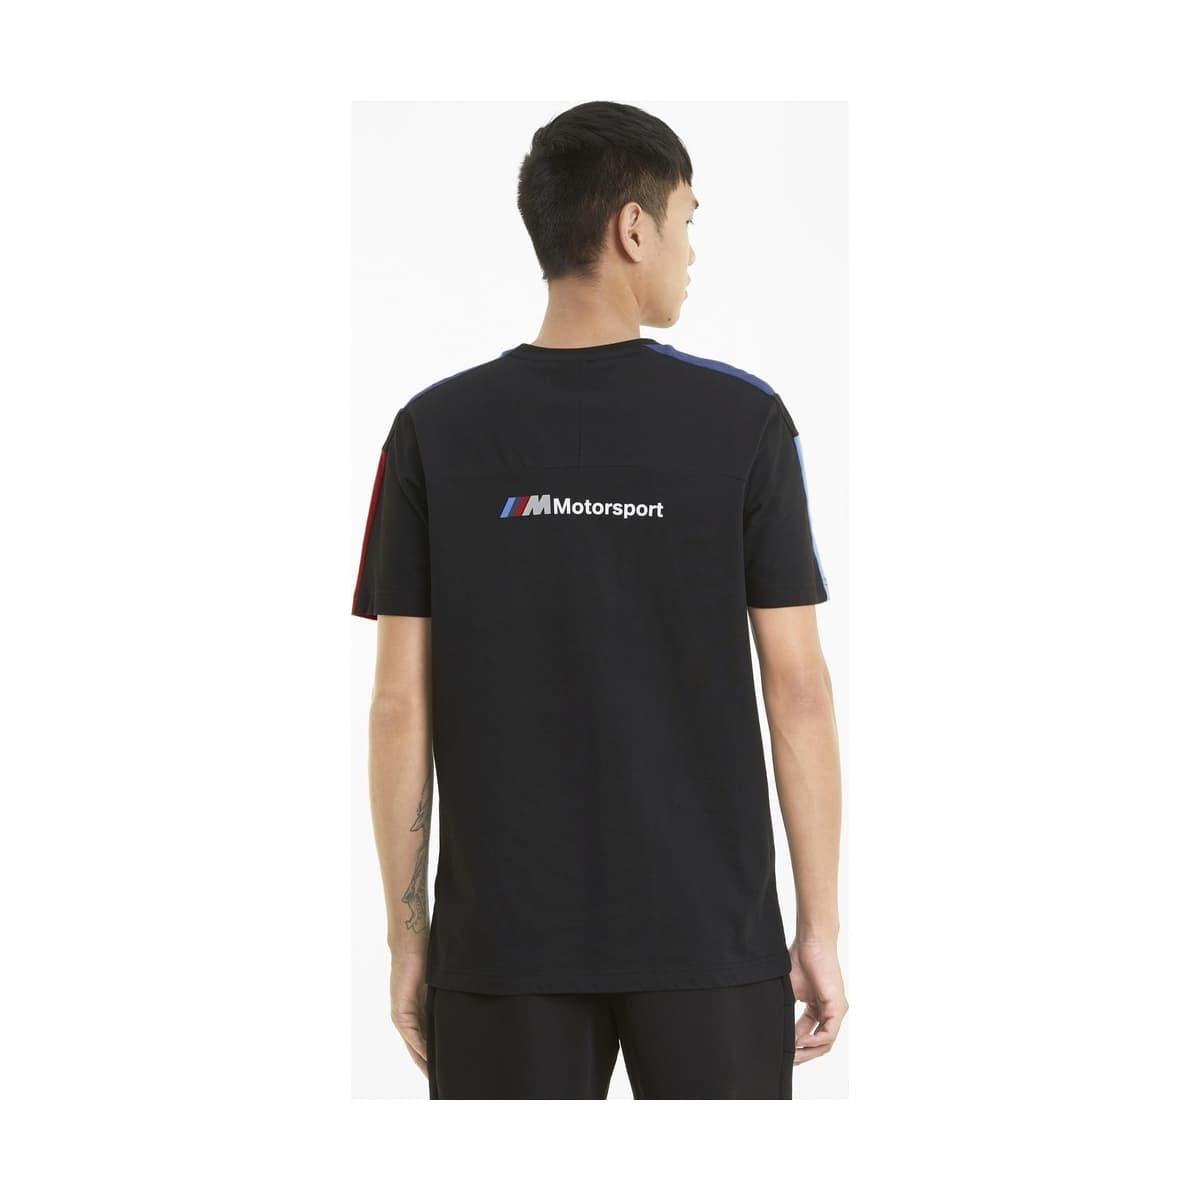 Bmw Motorsport T7 Erkek Siyah Tişört (599516-01)